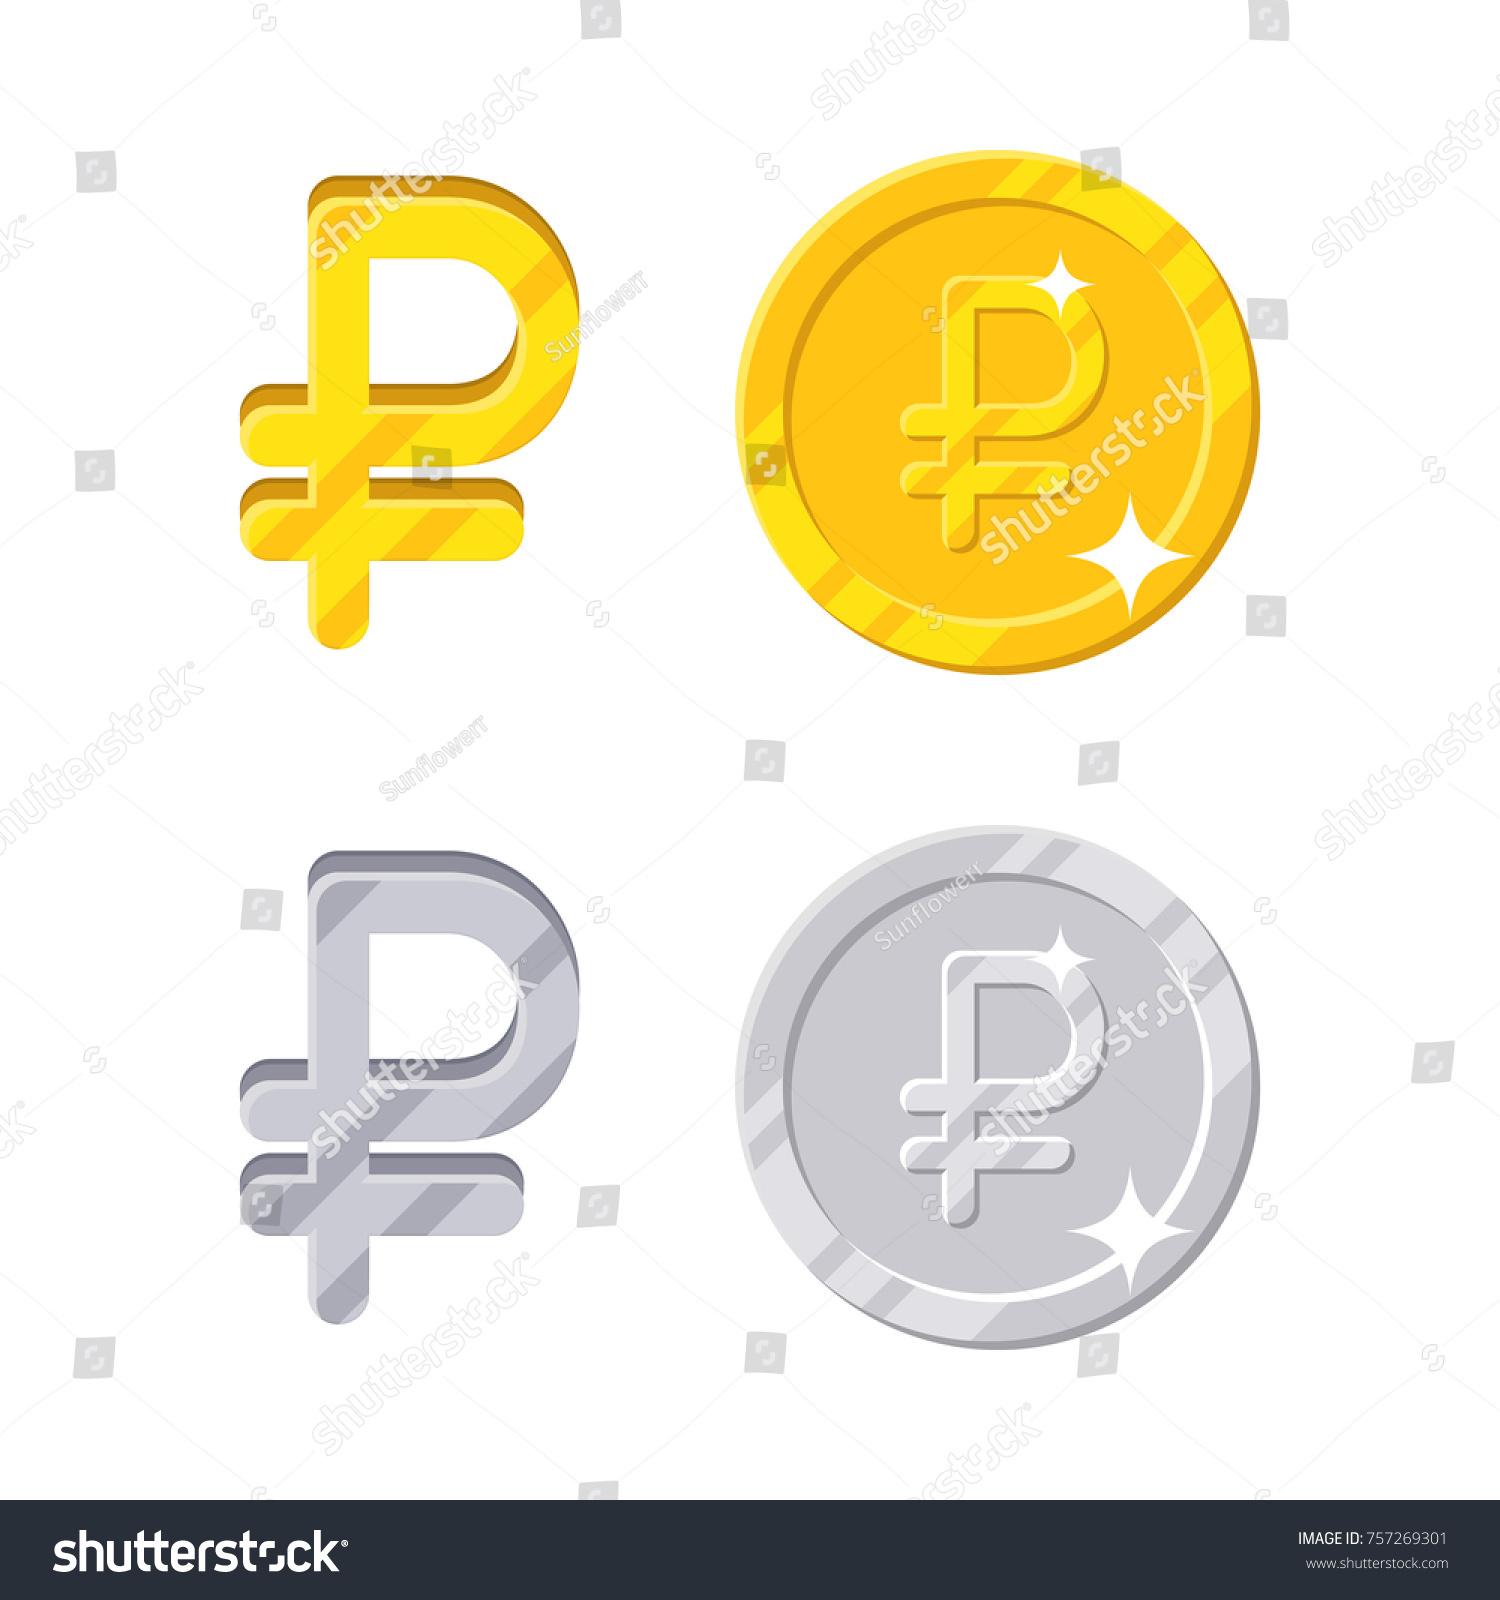 Russian Ruble Sign Gold Silver Symbol Stock Illustration 757269301